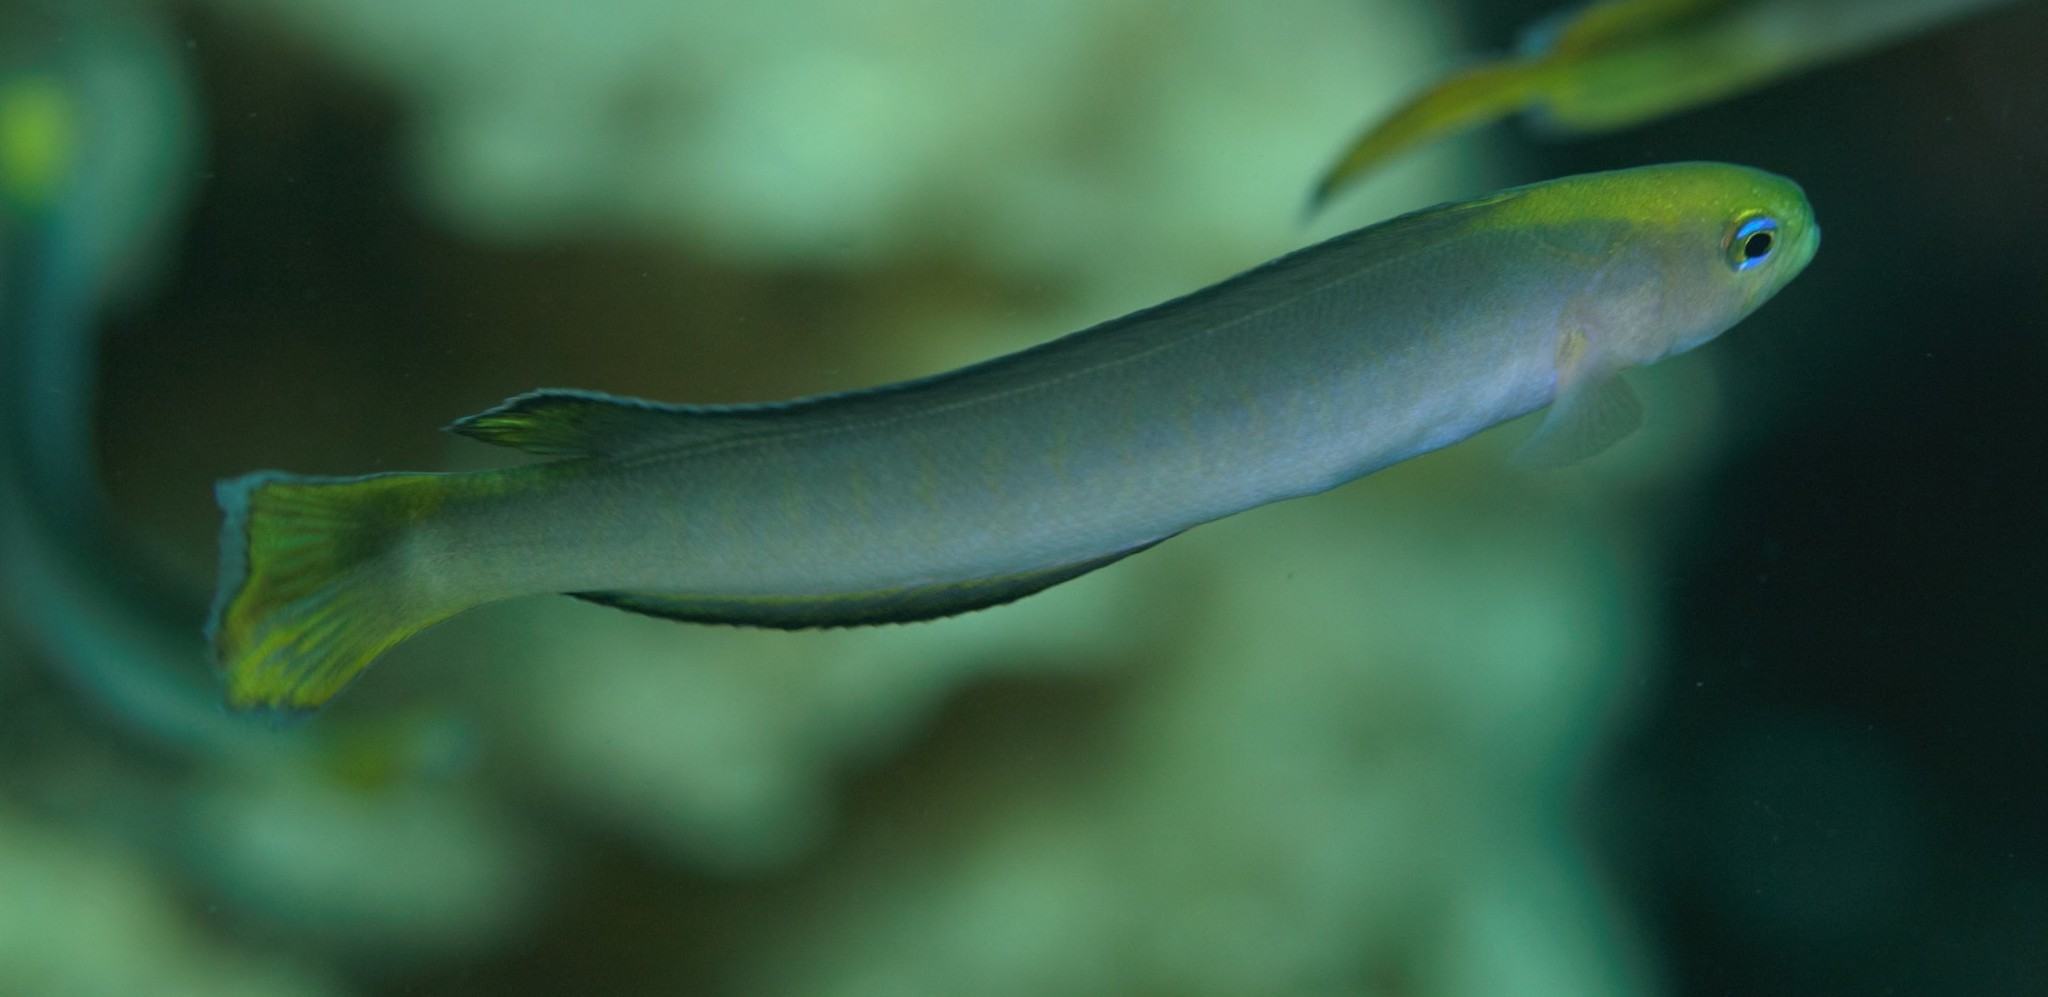 Image of Noarlunga hulafish